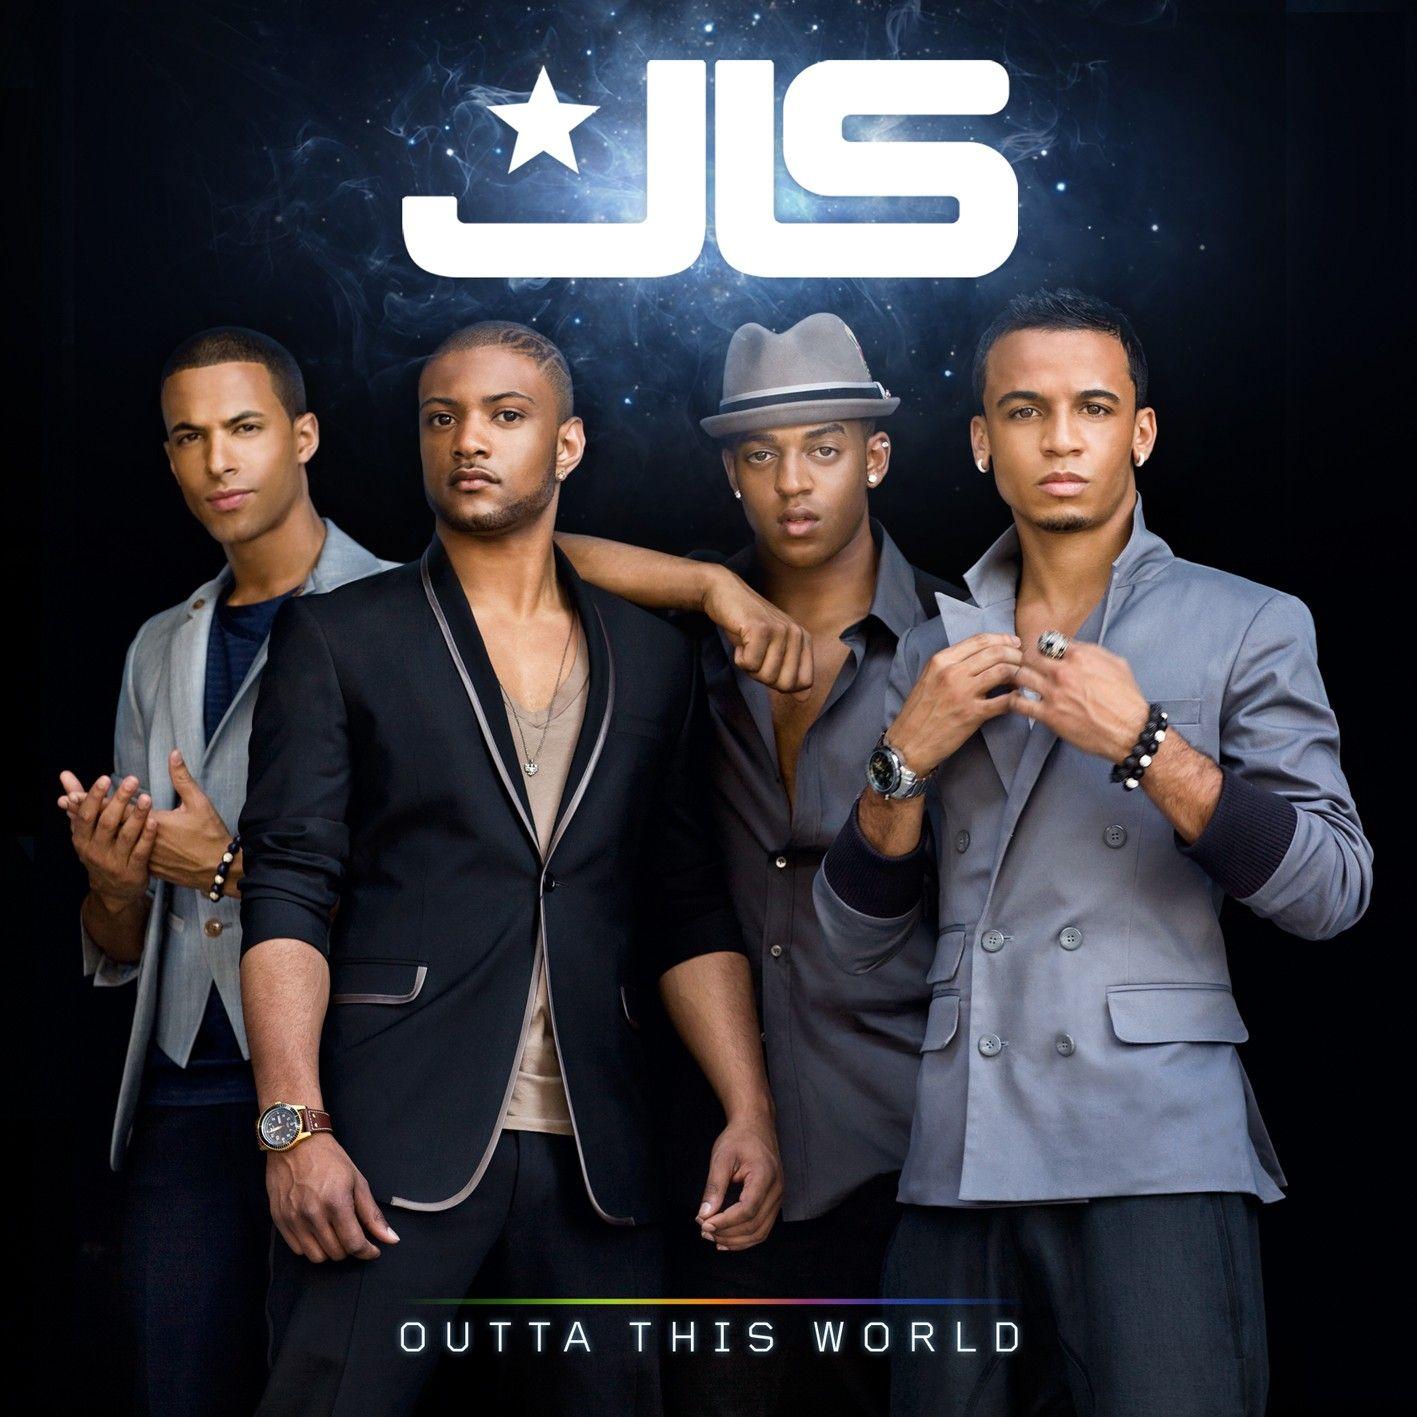 Jls - Outta This World album cover